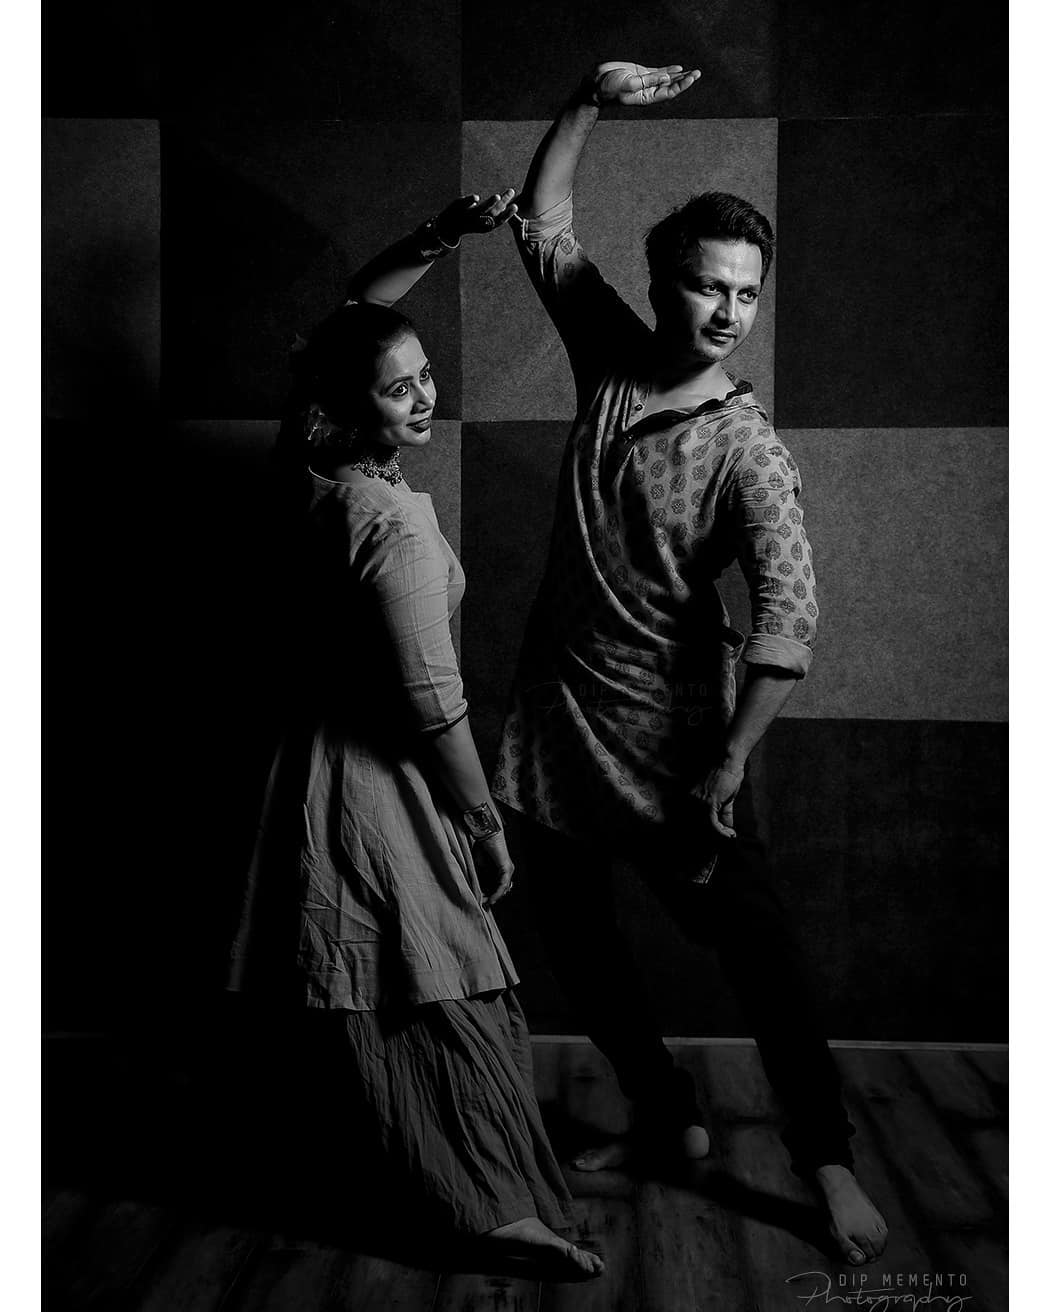 One of the favo. Pic.. Kathak Dance Video Shoot for  @nrityalayabyjashodapatel . . Photo/Videography: Dip Thakkar @dip_memento_photography . . Performers: @jashodapatel_kathak @hiteshchauhan_kathak  #kathakdancers #indiandancecrew #bollywooddance #dancersofindia  #kathak #kathakdance #classicaldance #ahmedabad #indianclassicaldance #pirouettes #chakkars #happydancing #classicaldance #indiandancer #dancersofinstagram #indianclassicaldance  #kathakdance #kathakdancer #indianclassicaldancers #9924227745 #spins  #worldofdance #dance #indiandanceform #loveforkathak #dancers #dancersindia